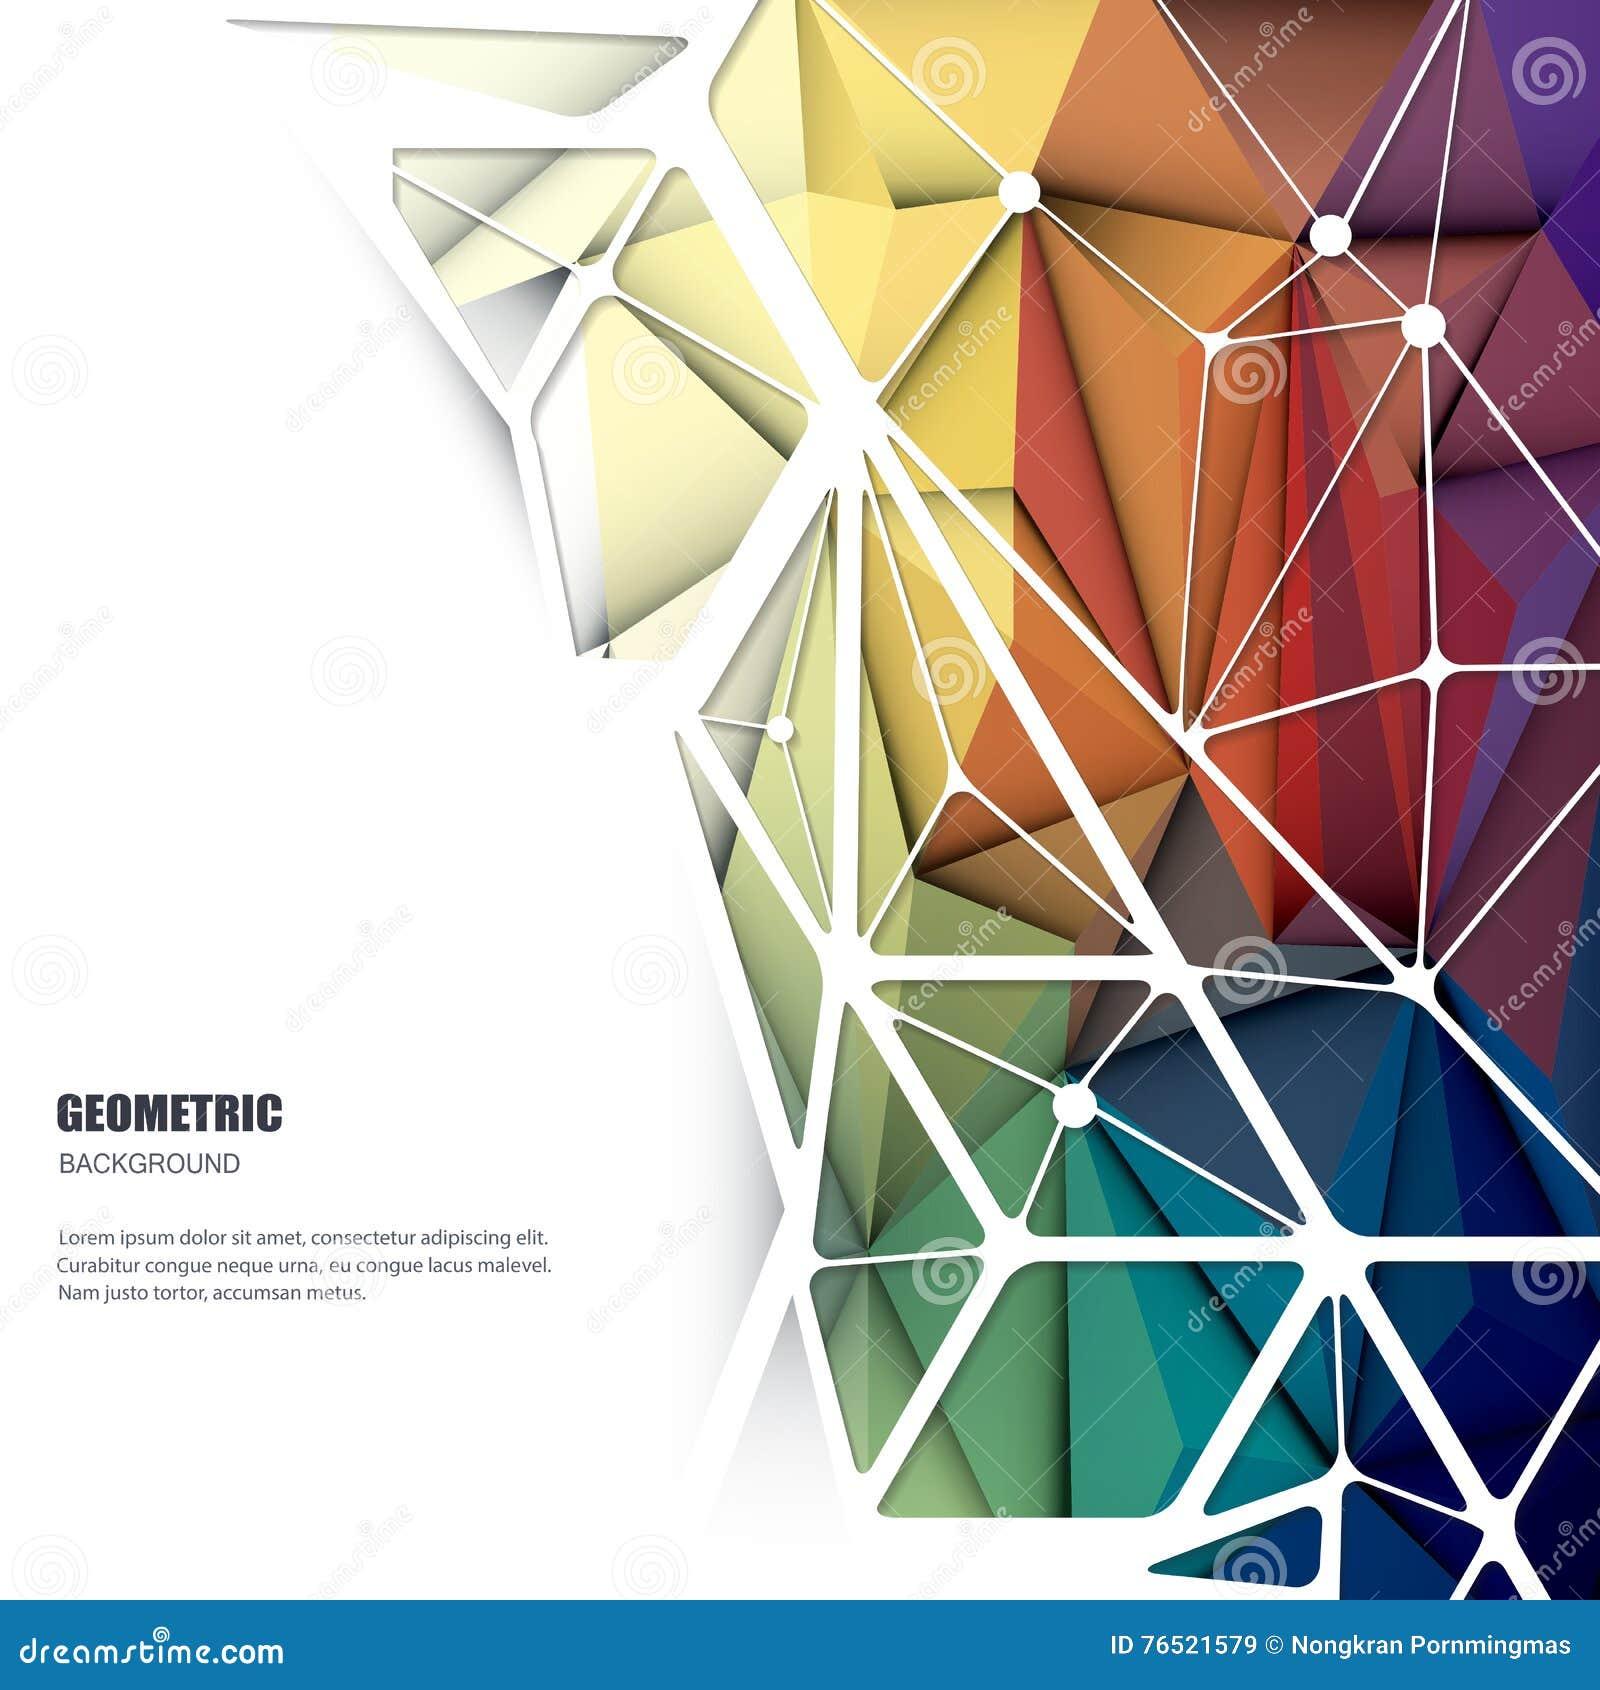 geometric yellow background illustration - photo #41